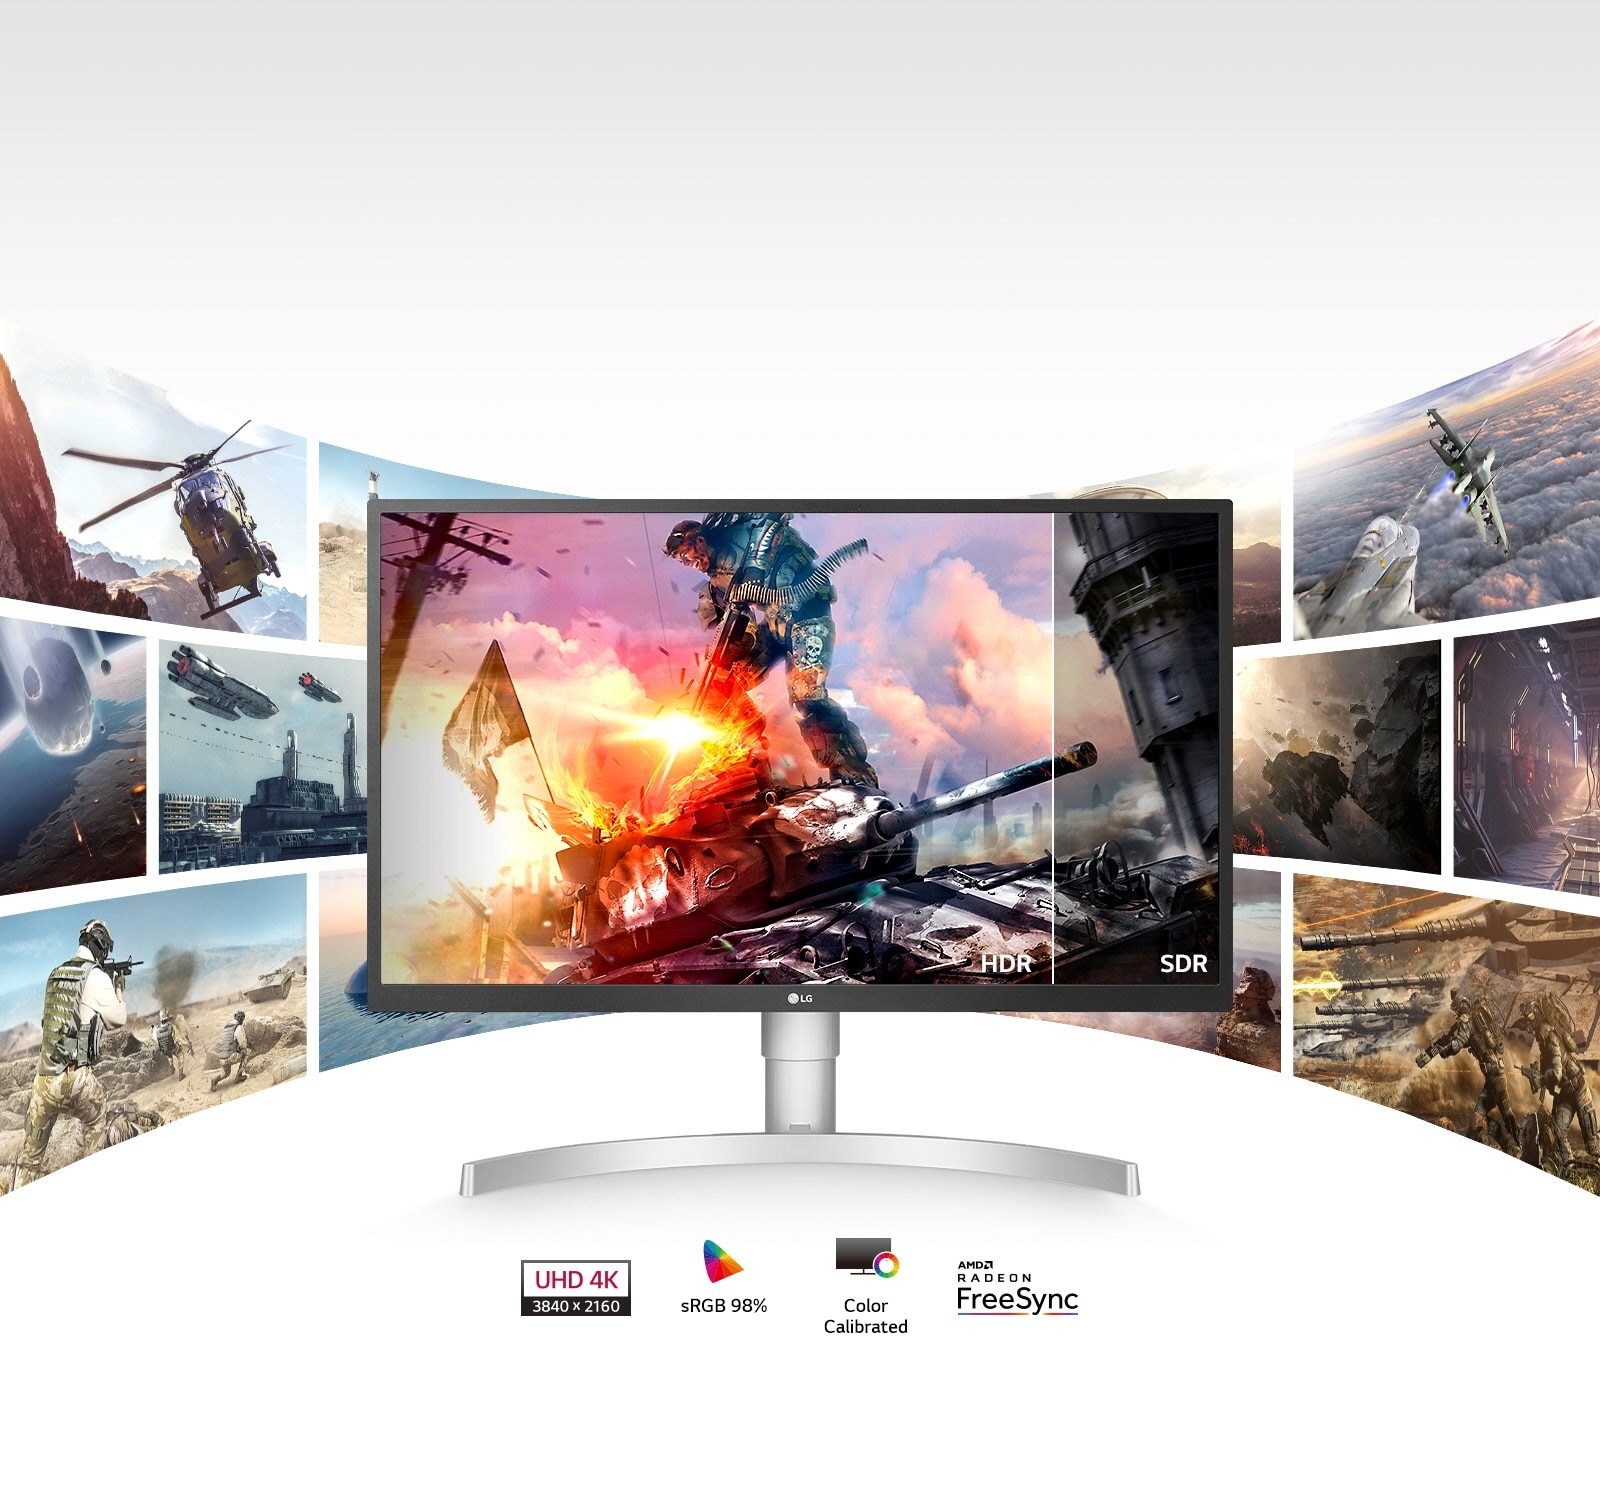 Meet the UHD 4K HDR Monitor1